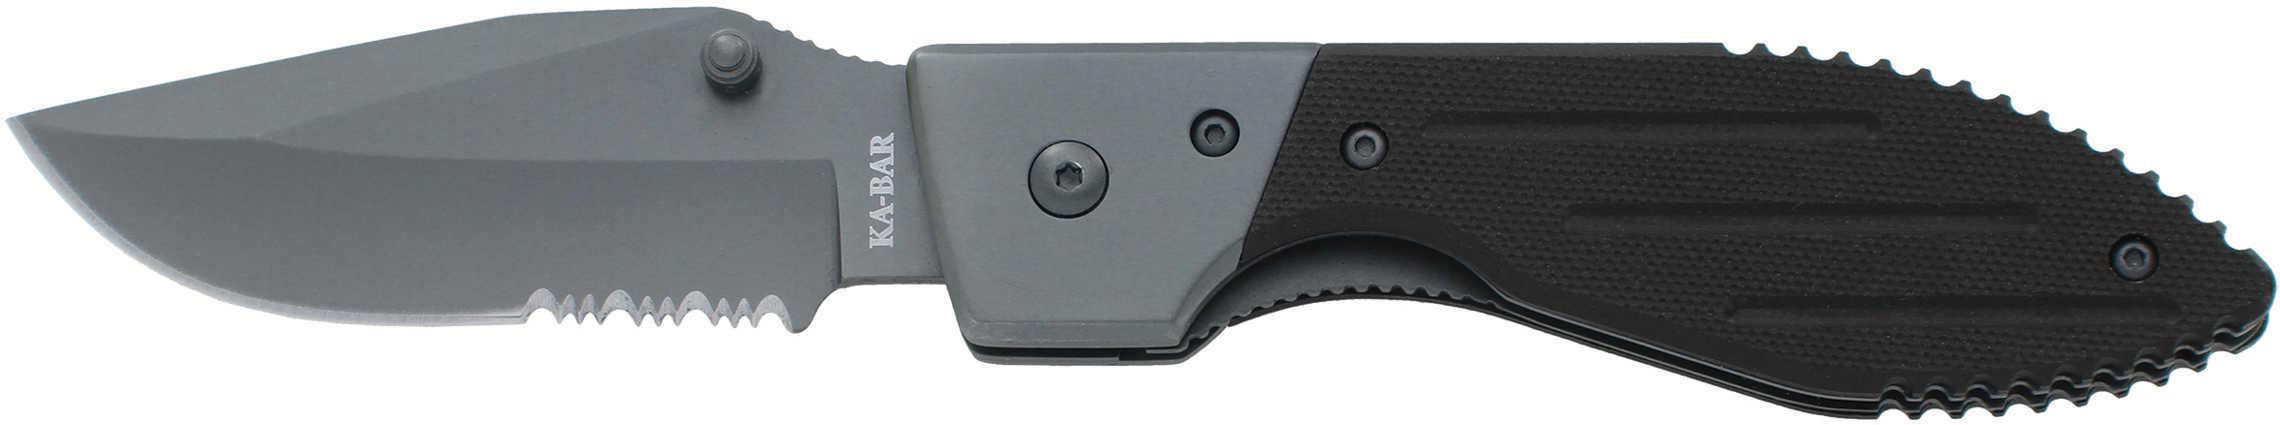 "Ka-Bar 3073 Warthog Folder 3"" 5Cr15 Stainless Steel Clip Point G10 Black"